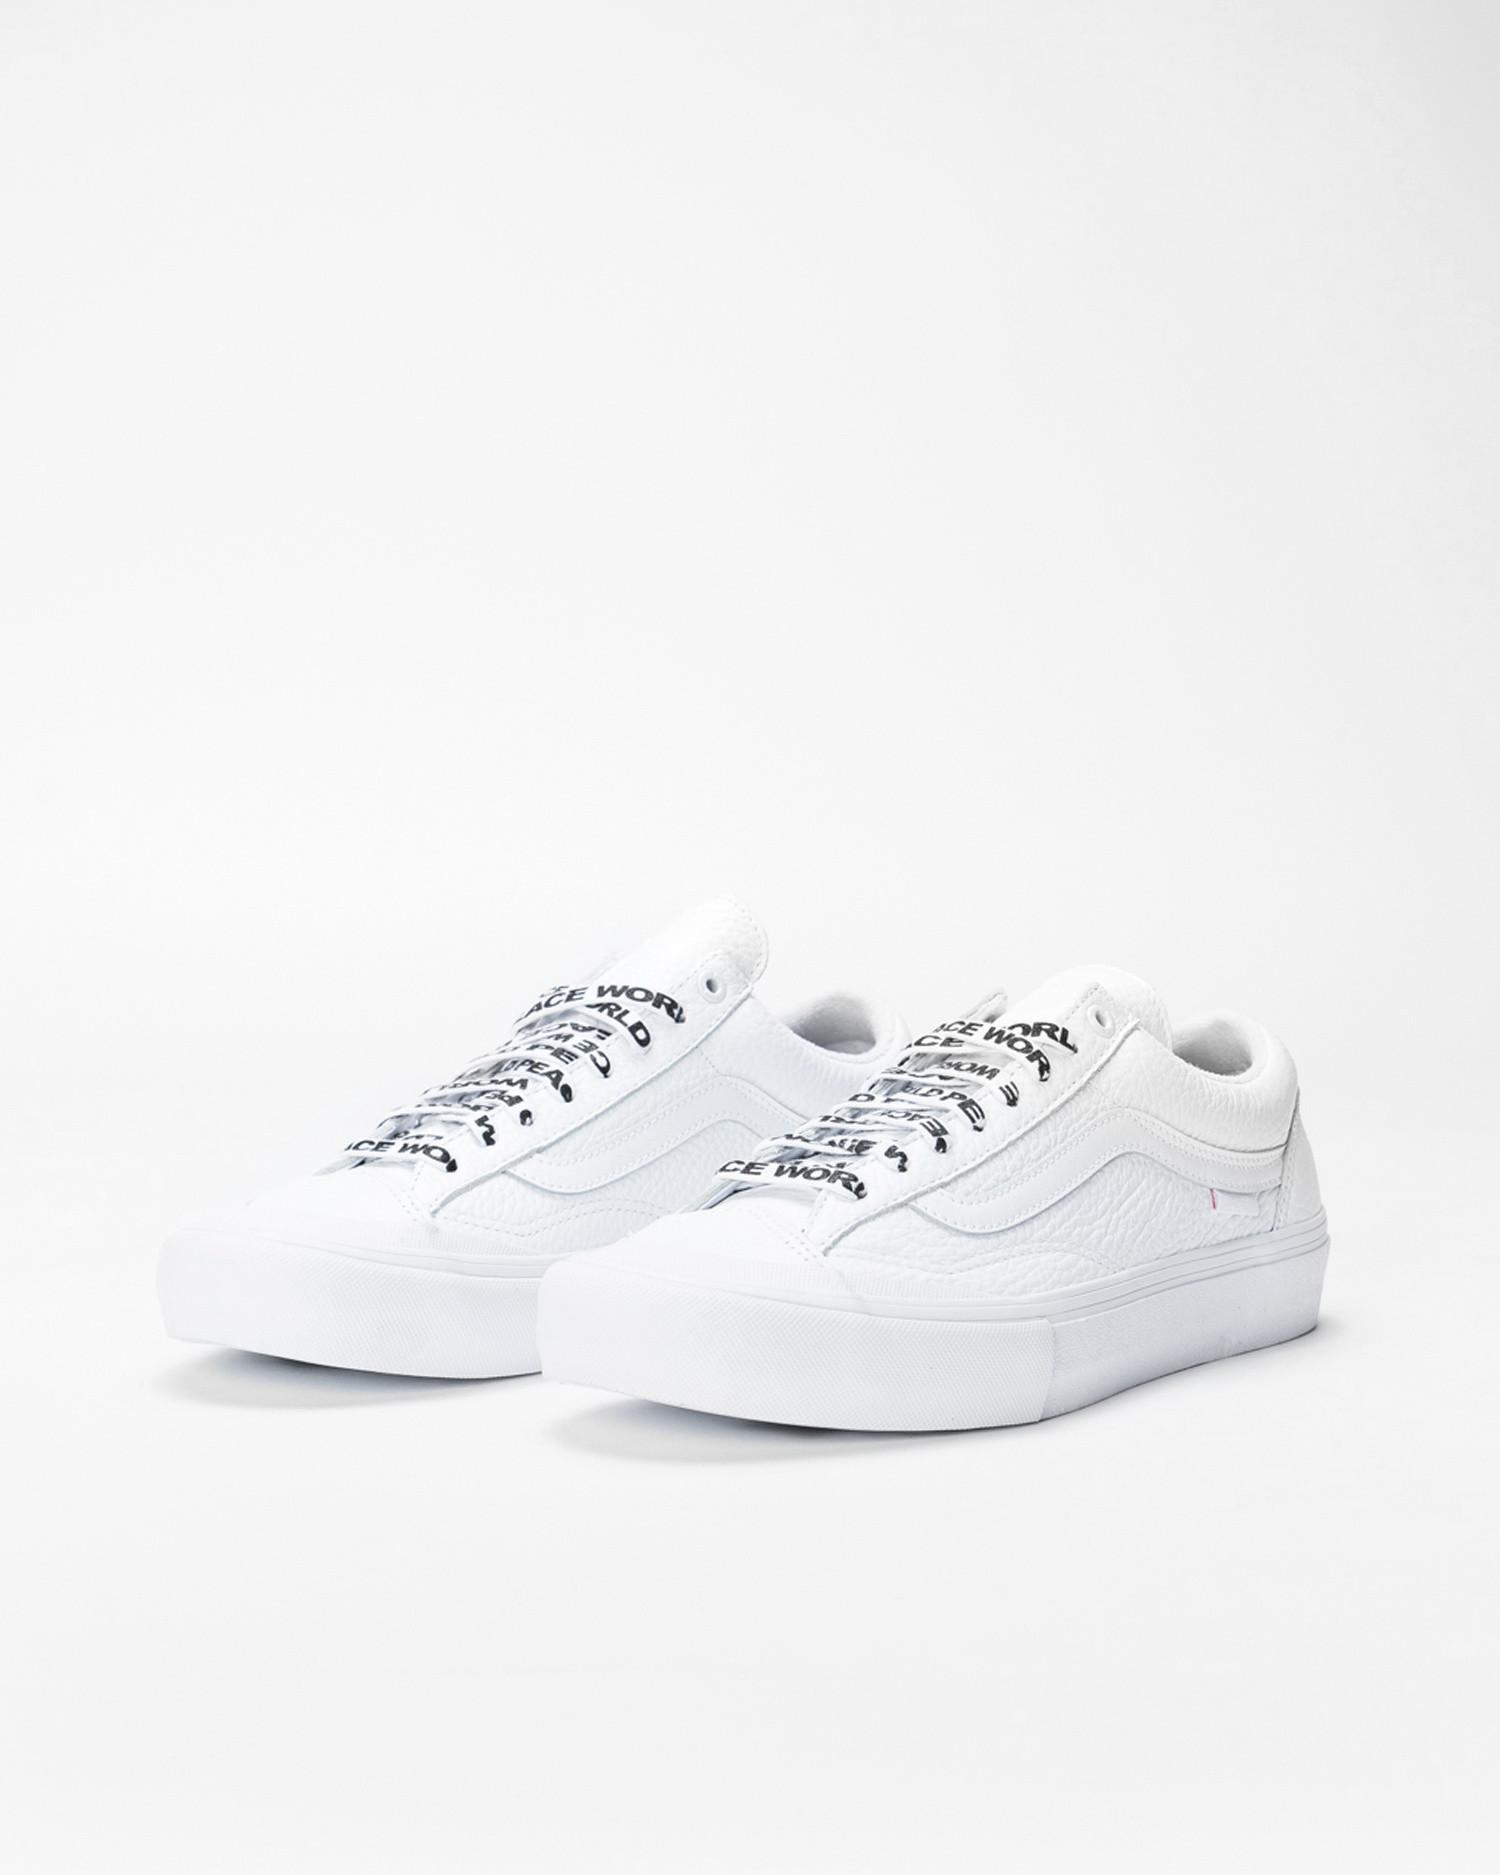 Vans Style 36 Pro Justin Henry White/White